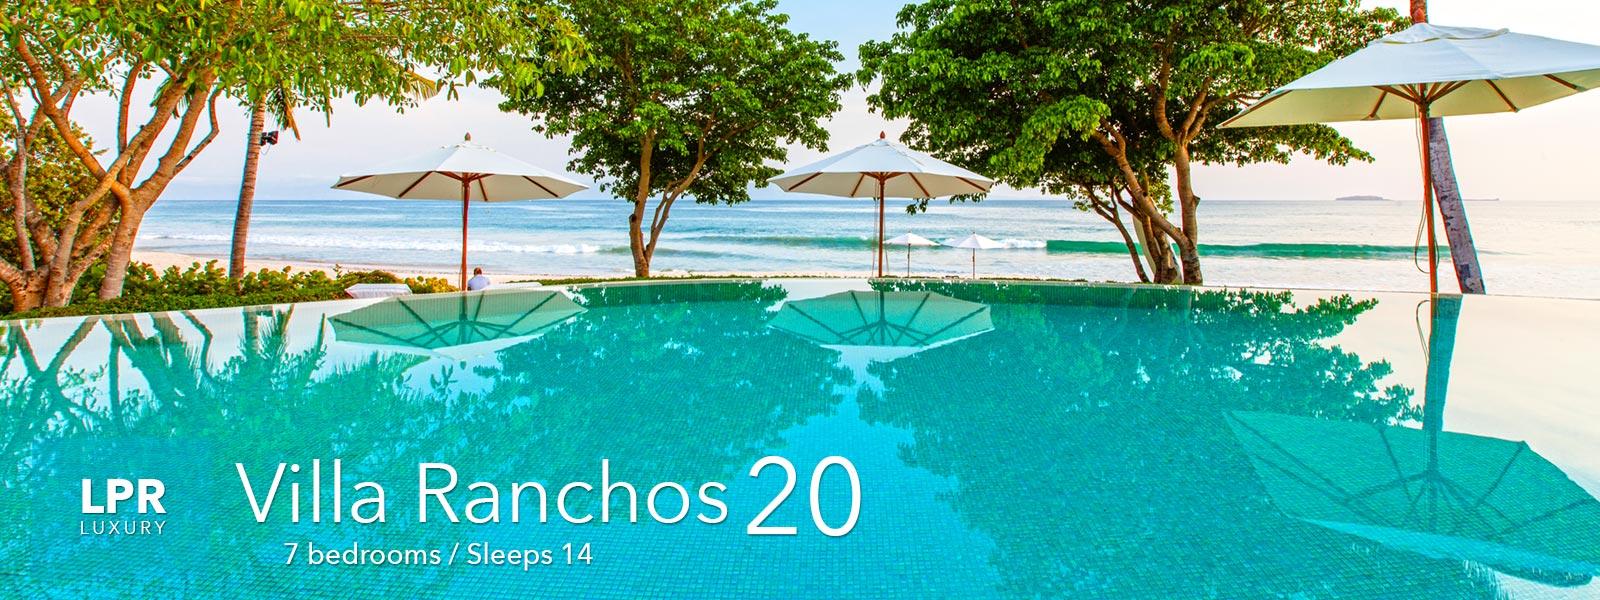 Villa Ranchos 20 - Luxury Vacation Rental Villa at the Punta Mita Resort, Riviera Nayarit, Mexico